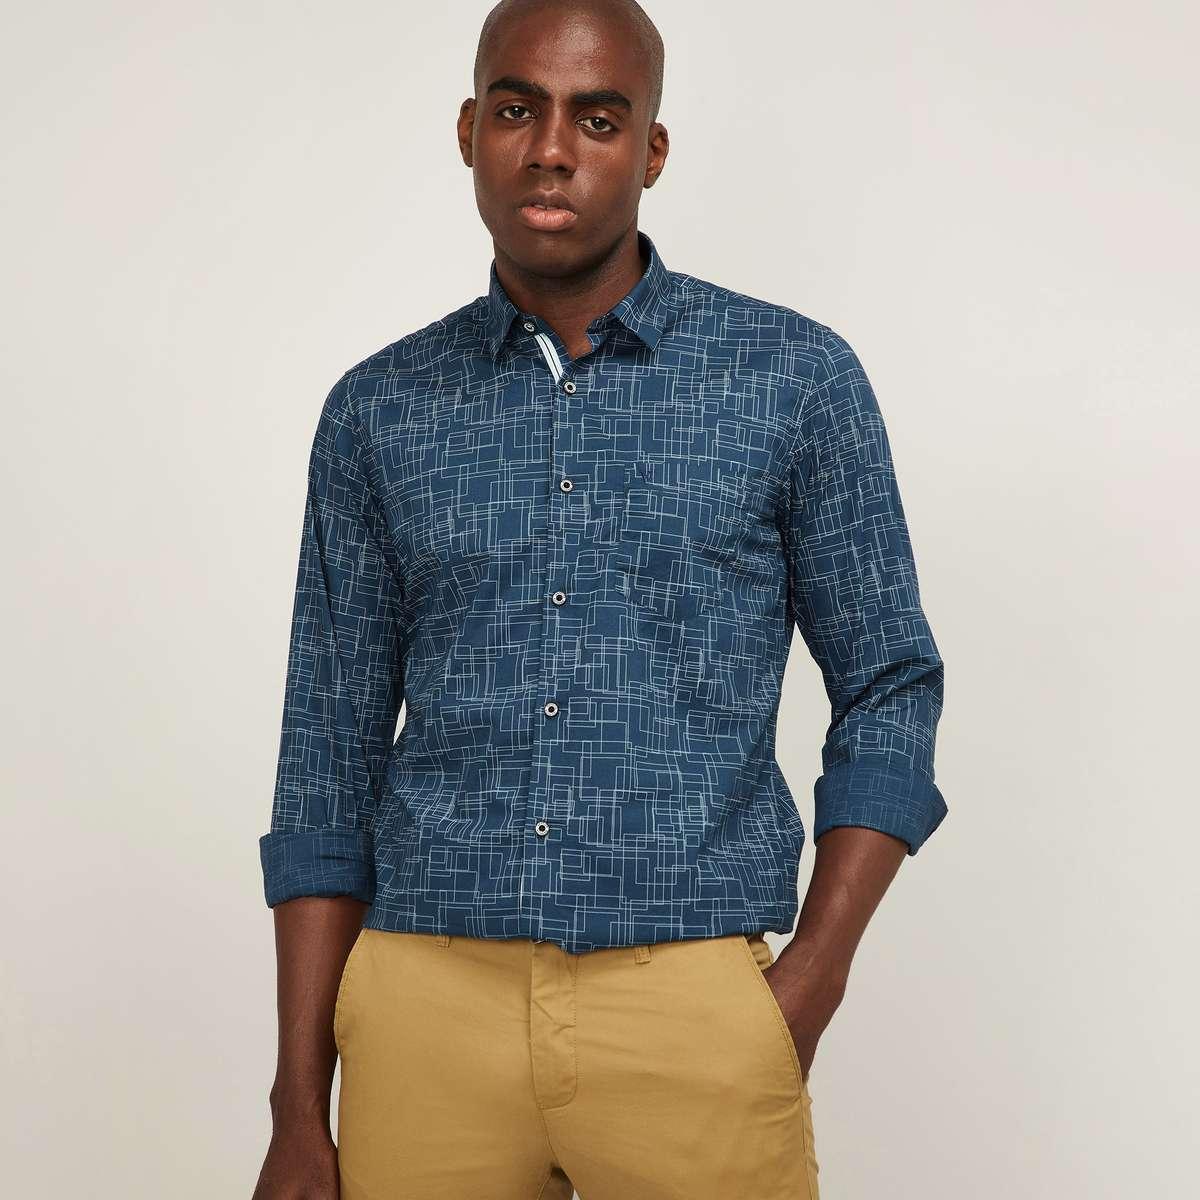 11.VH SPORTS Men Full Sleeves Printed Casual Shirt